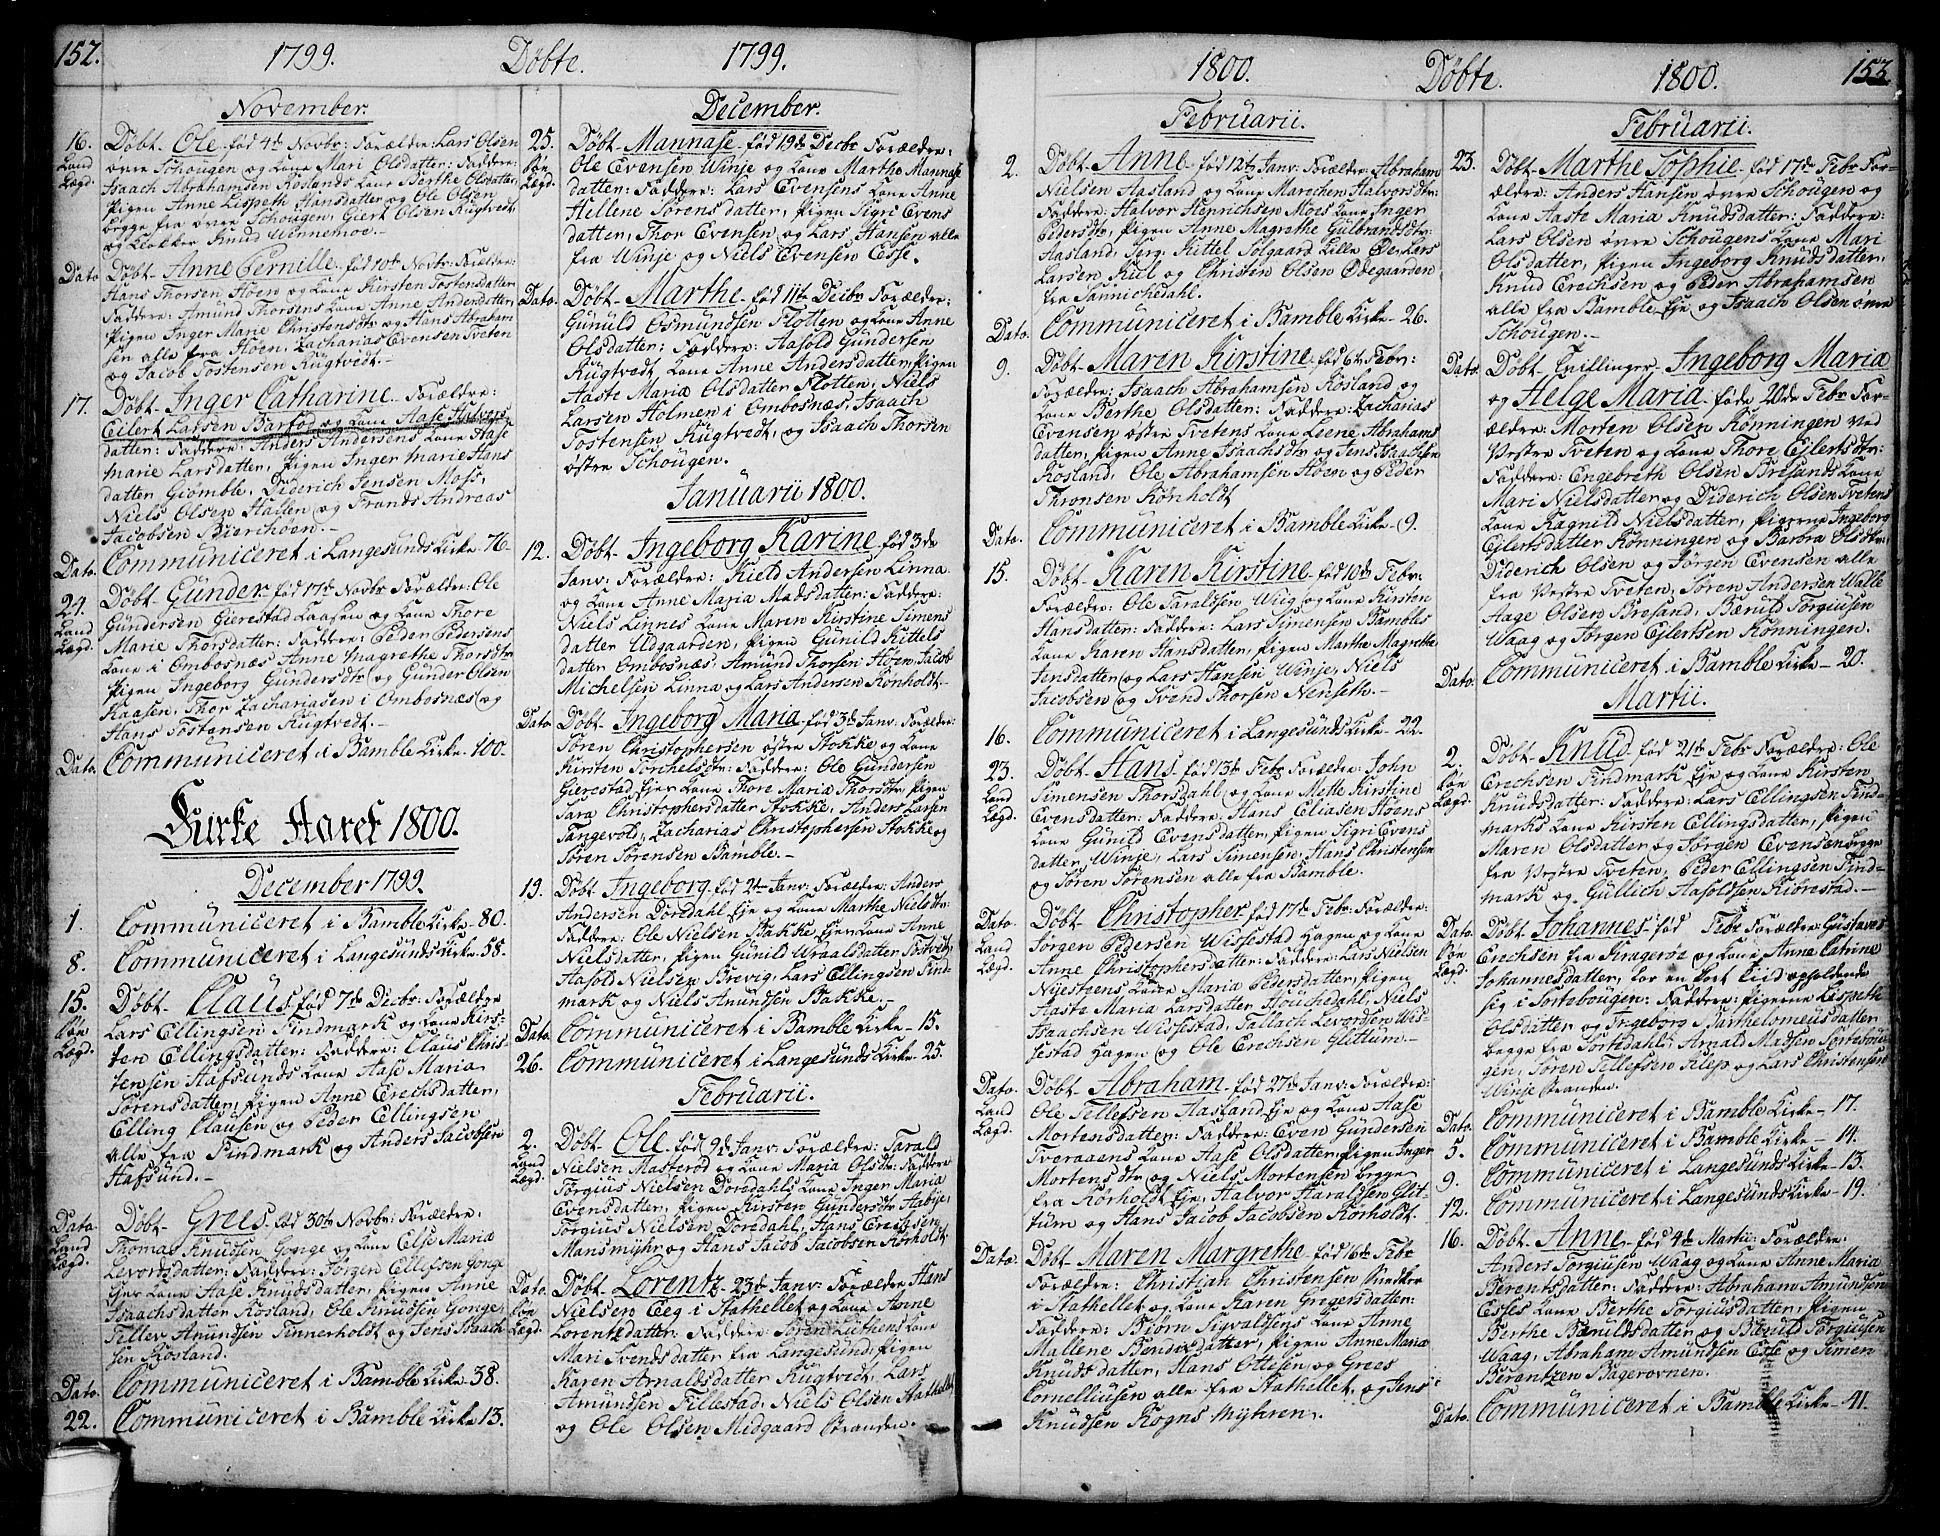 SAKO, Bamble kirkebøker, F/Fa/L0002: Ministerialbok nr. I 2, 1775-1814, s. 152-153